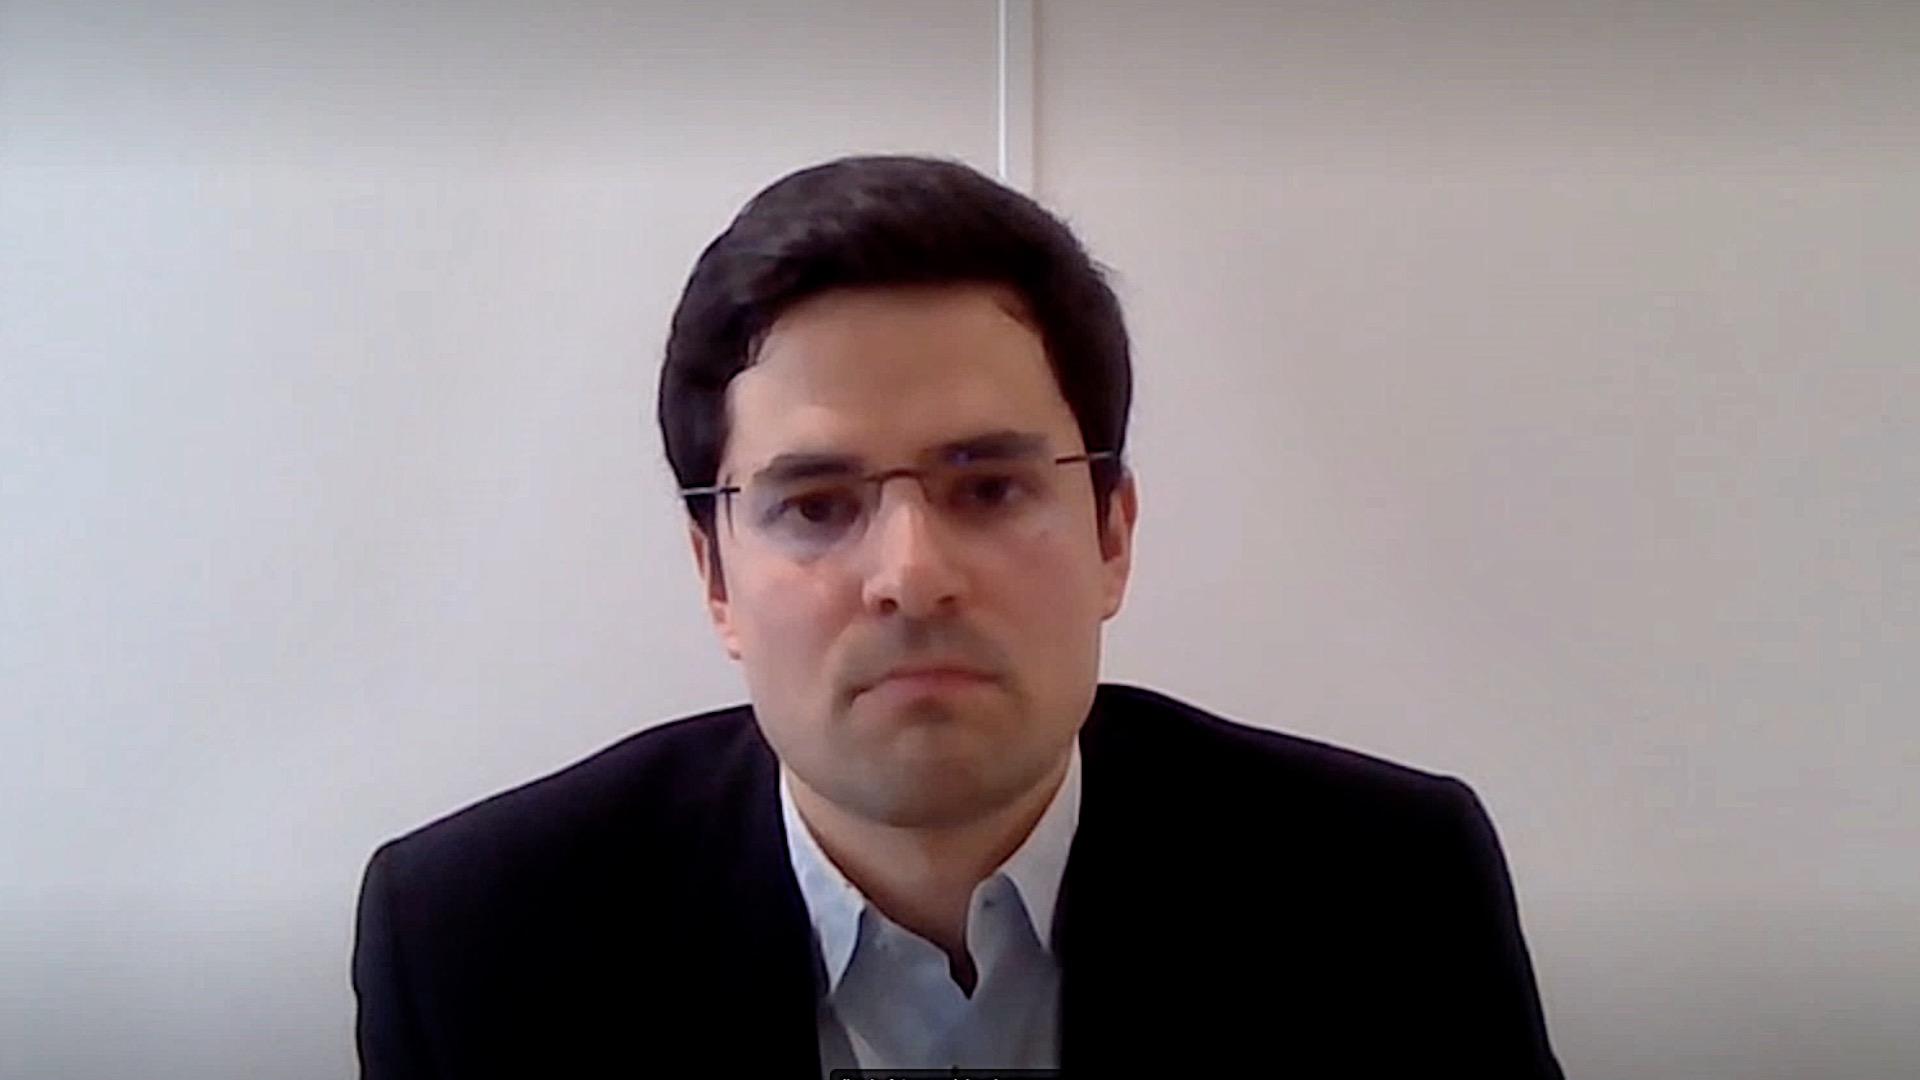 Alvaro sanmartin covid19